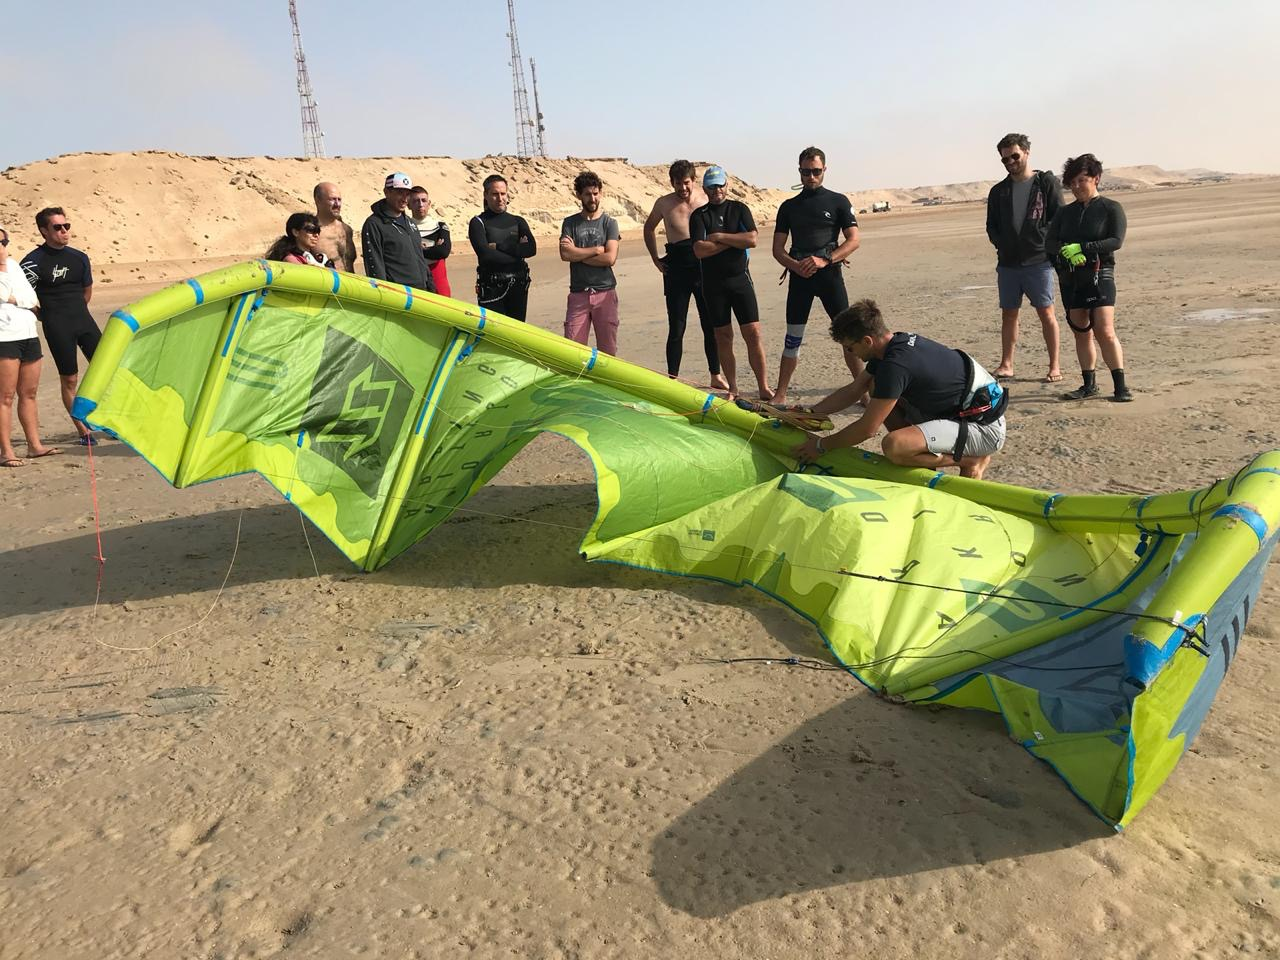 Kitesurf lessons Dakhla | Morocco | Kite Control.jpg